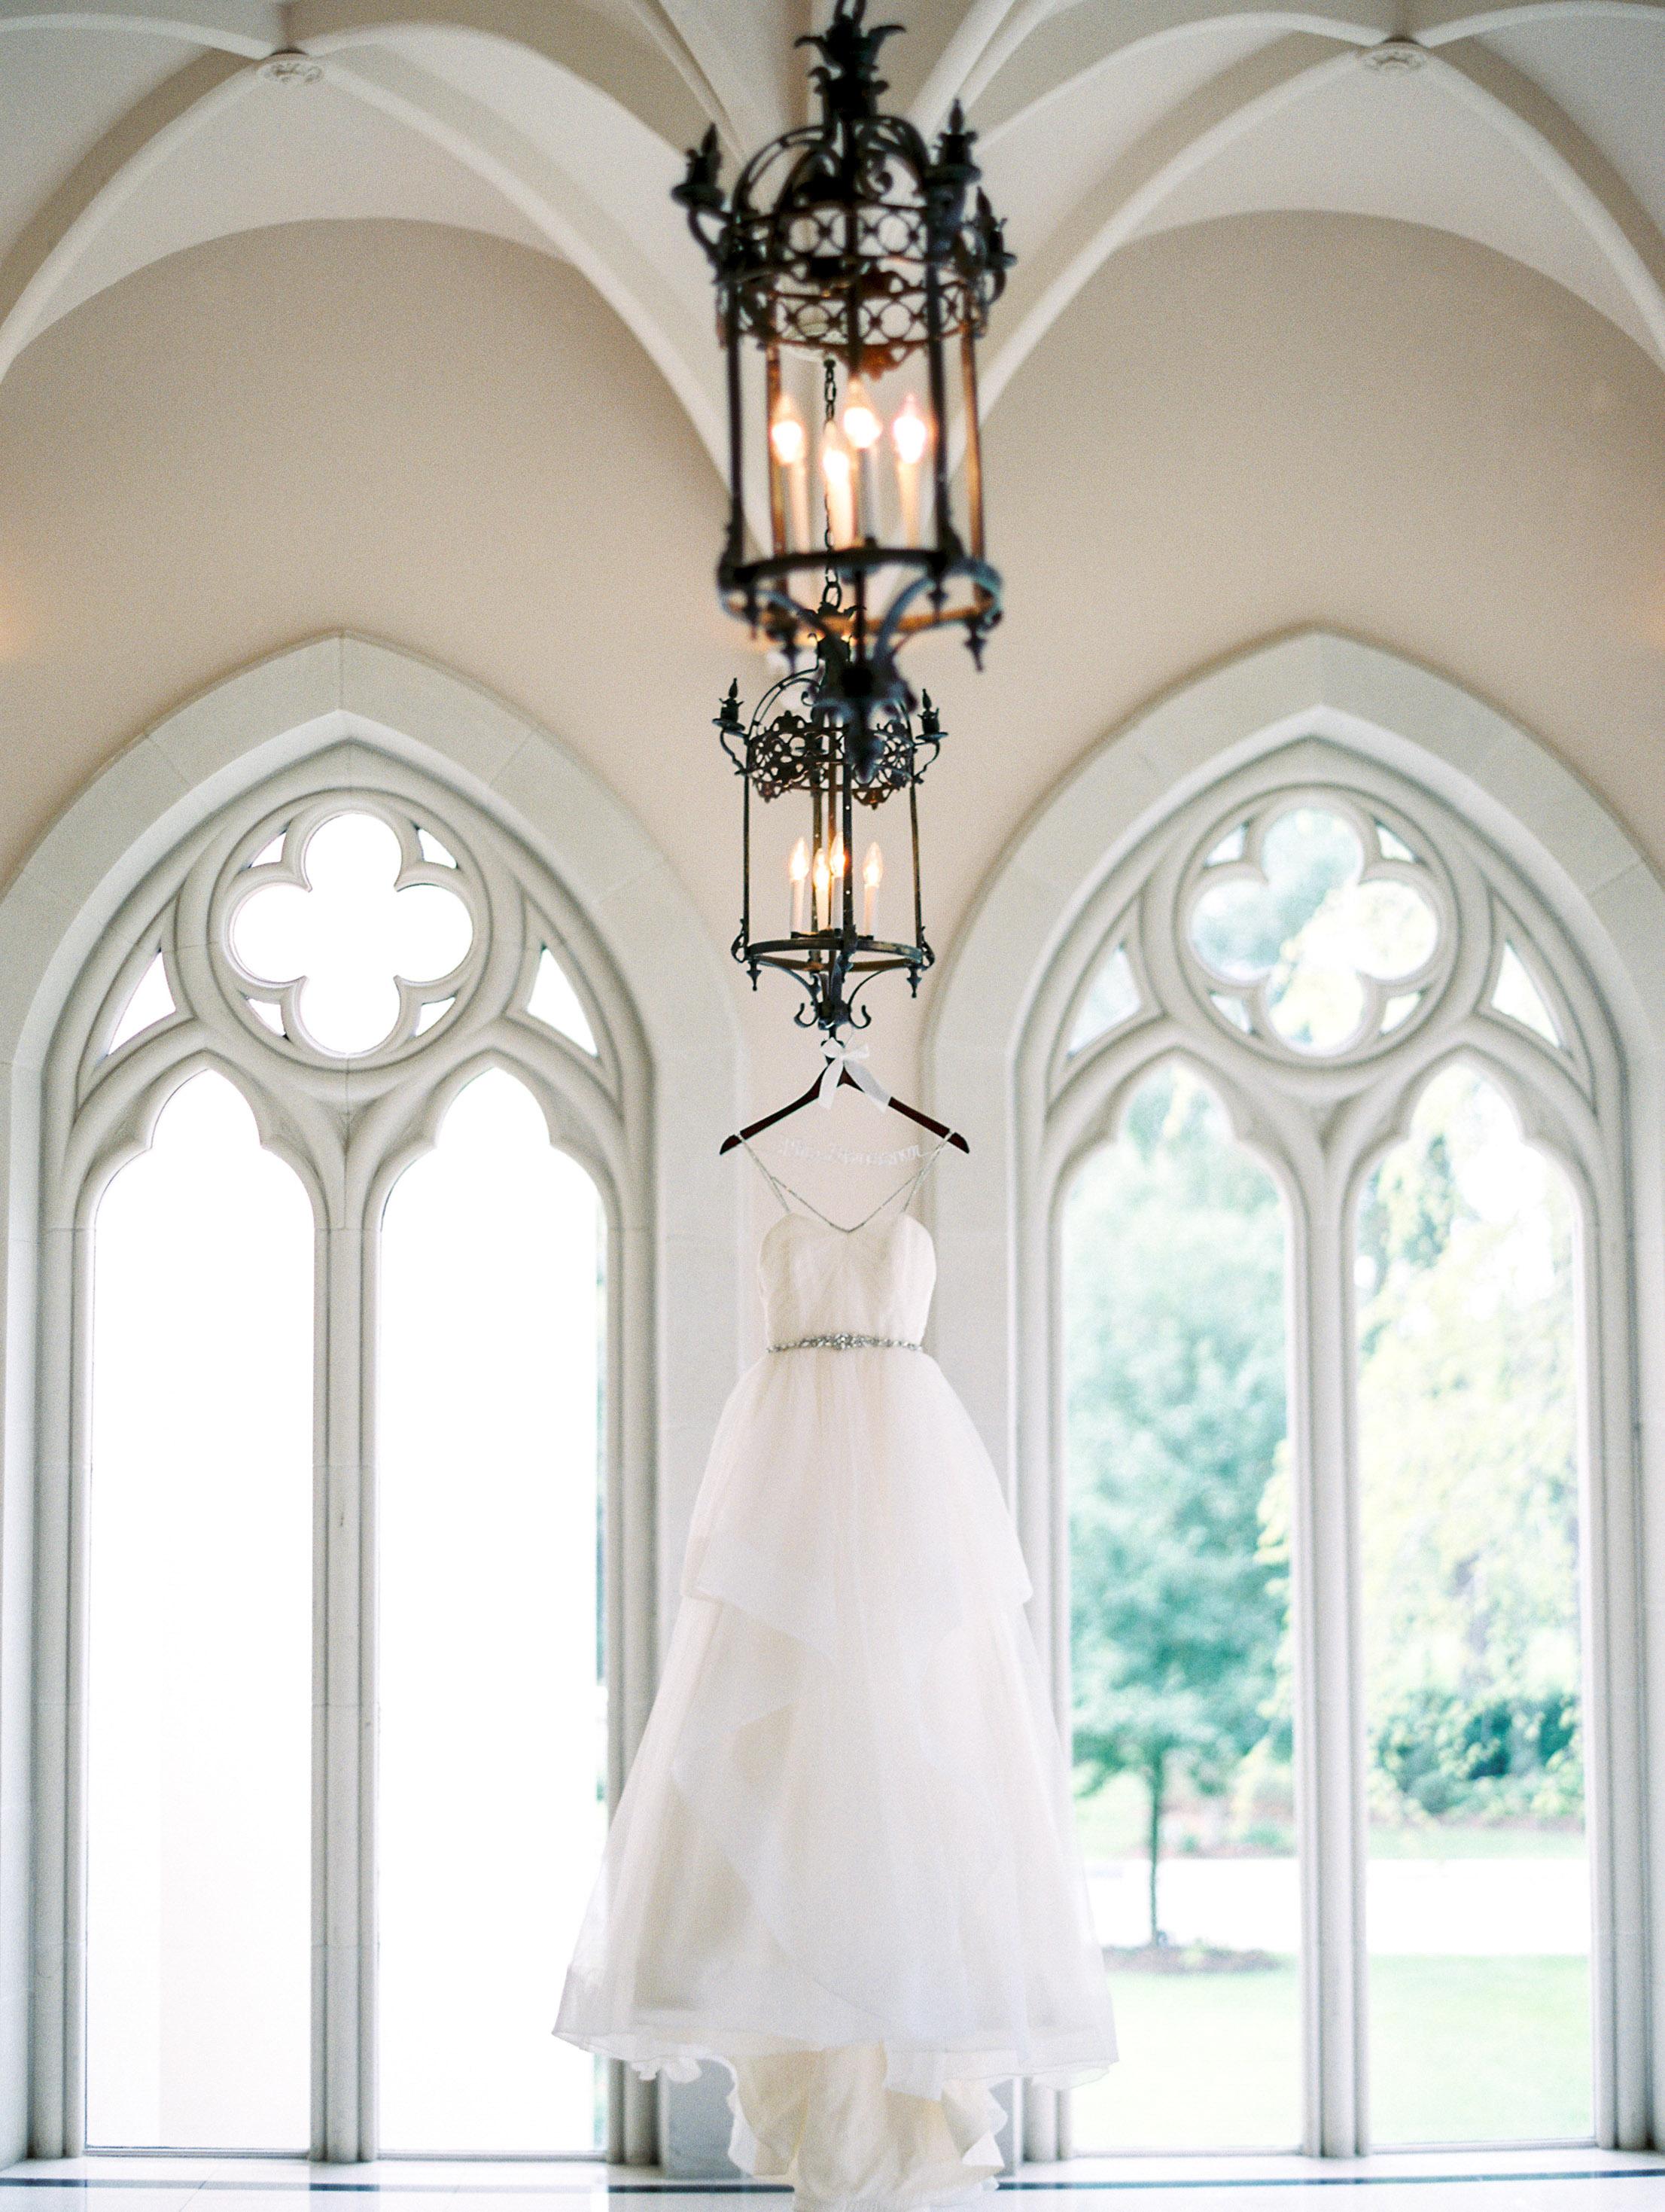 Dana-Fernandez-Photography-Weddings-in-Houston-Magazine-feature-Houston-wedding-photographer-film-4.jpg